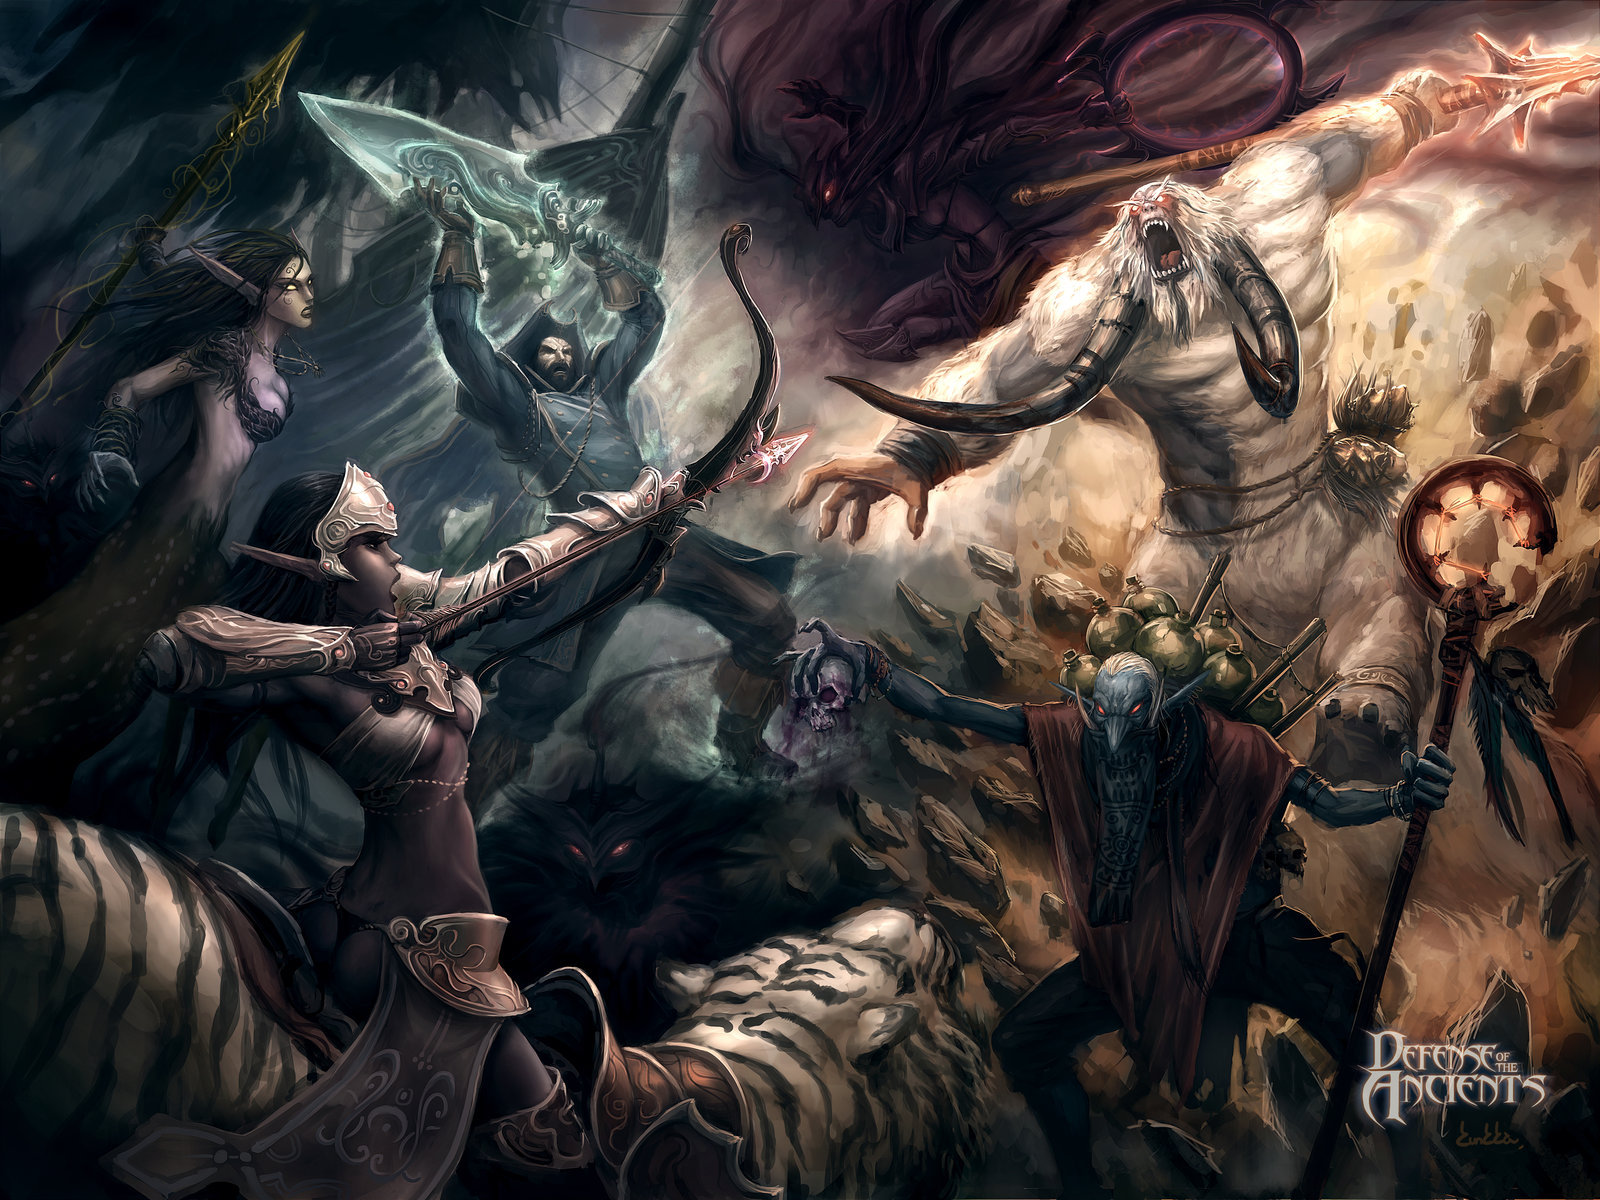 13 World Of Warcraft WOW DOTA 2 Wallpapers HD